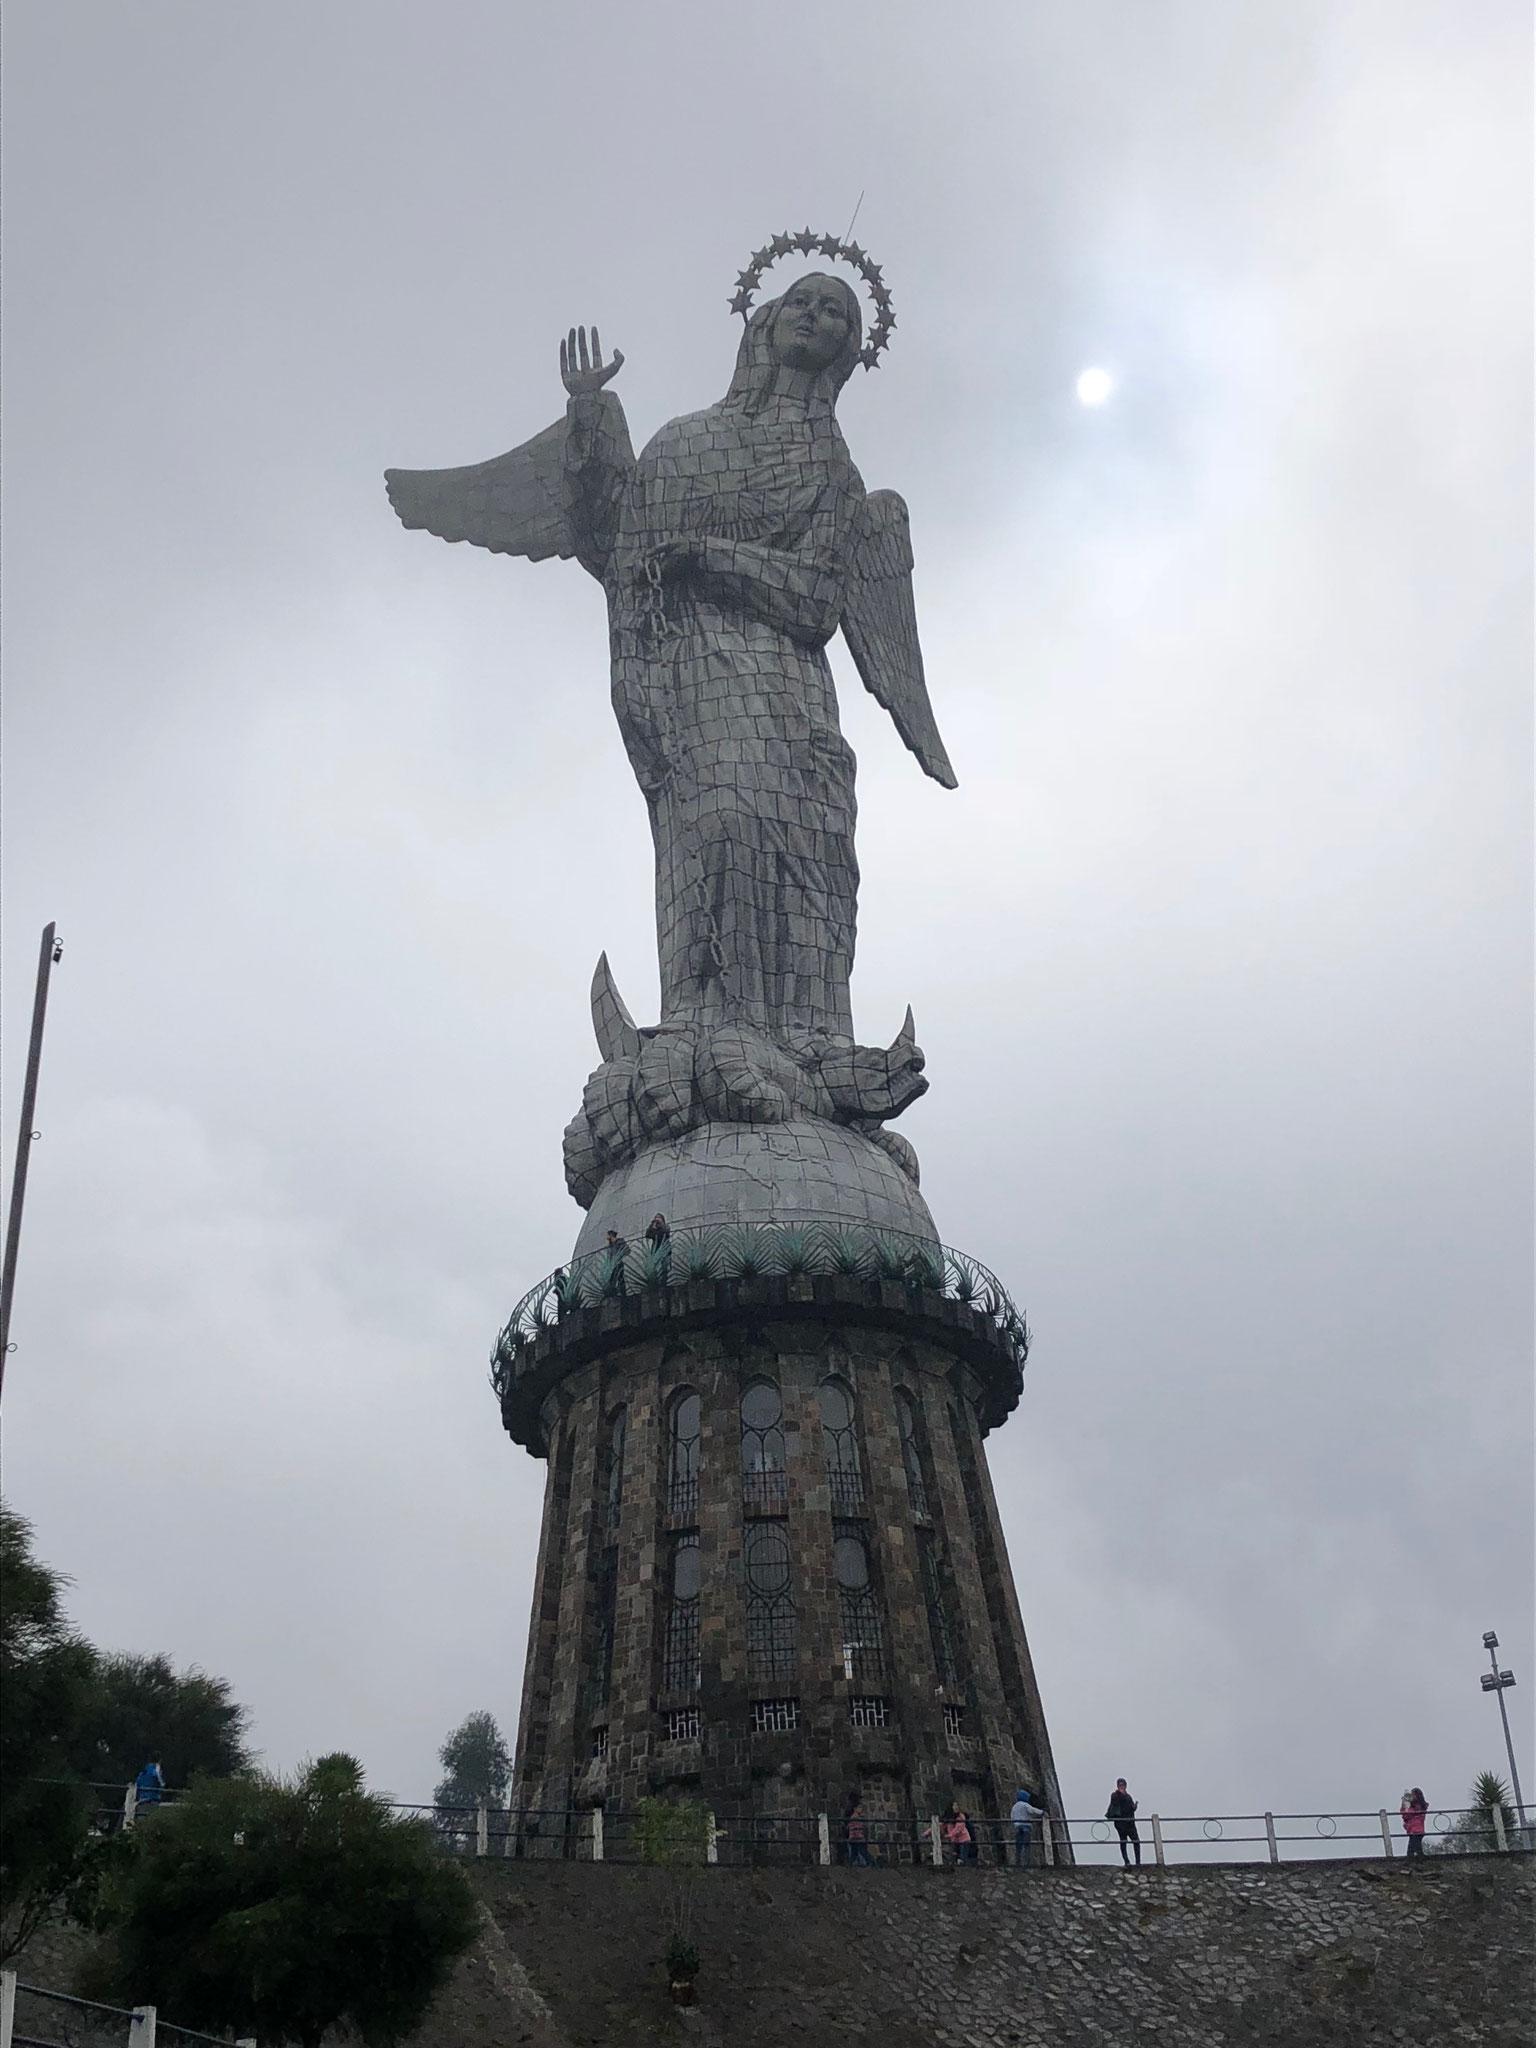 Mariafigur auf dem Hügel